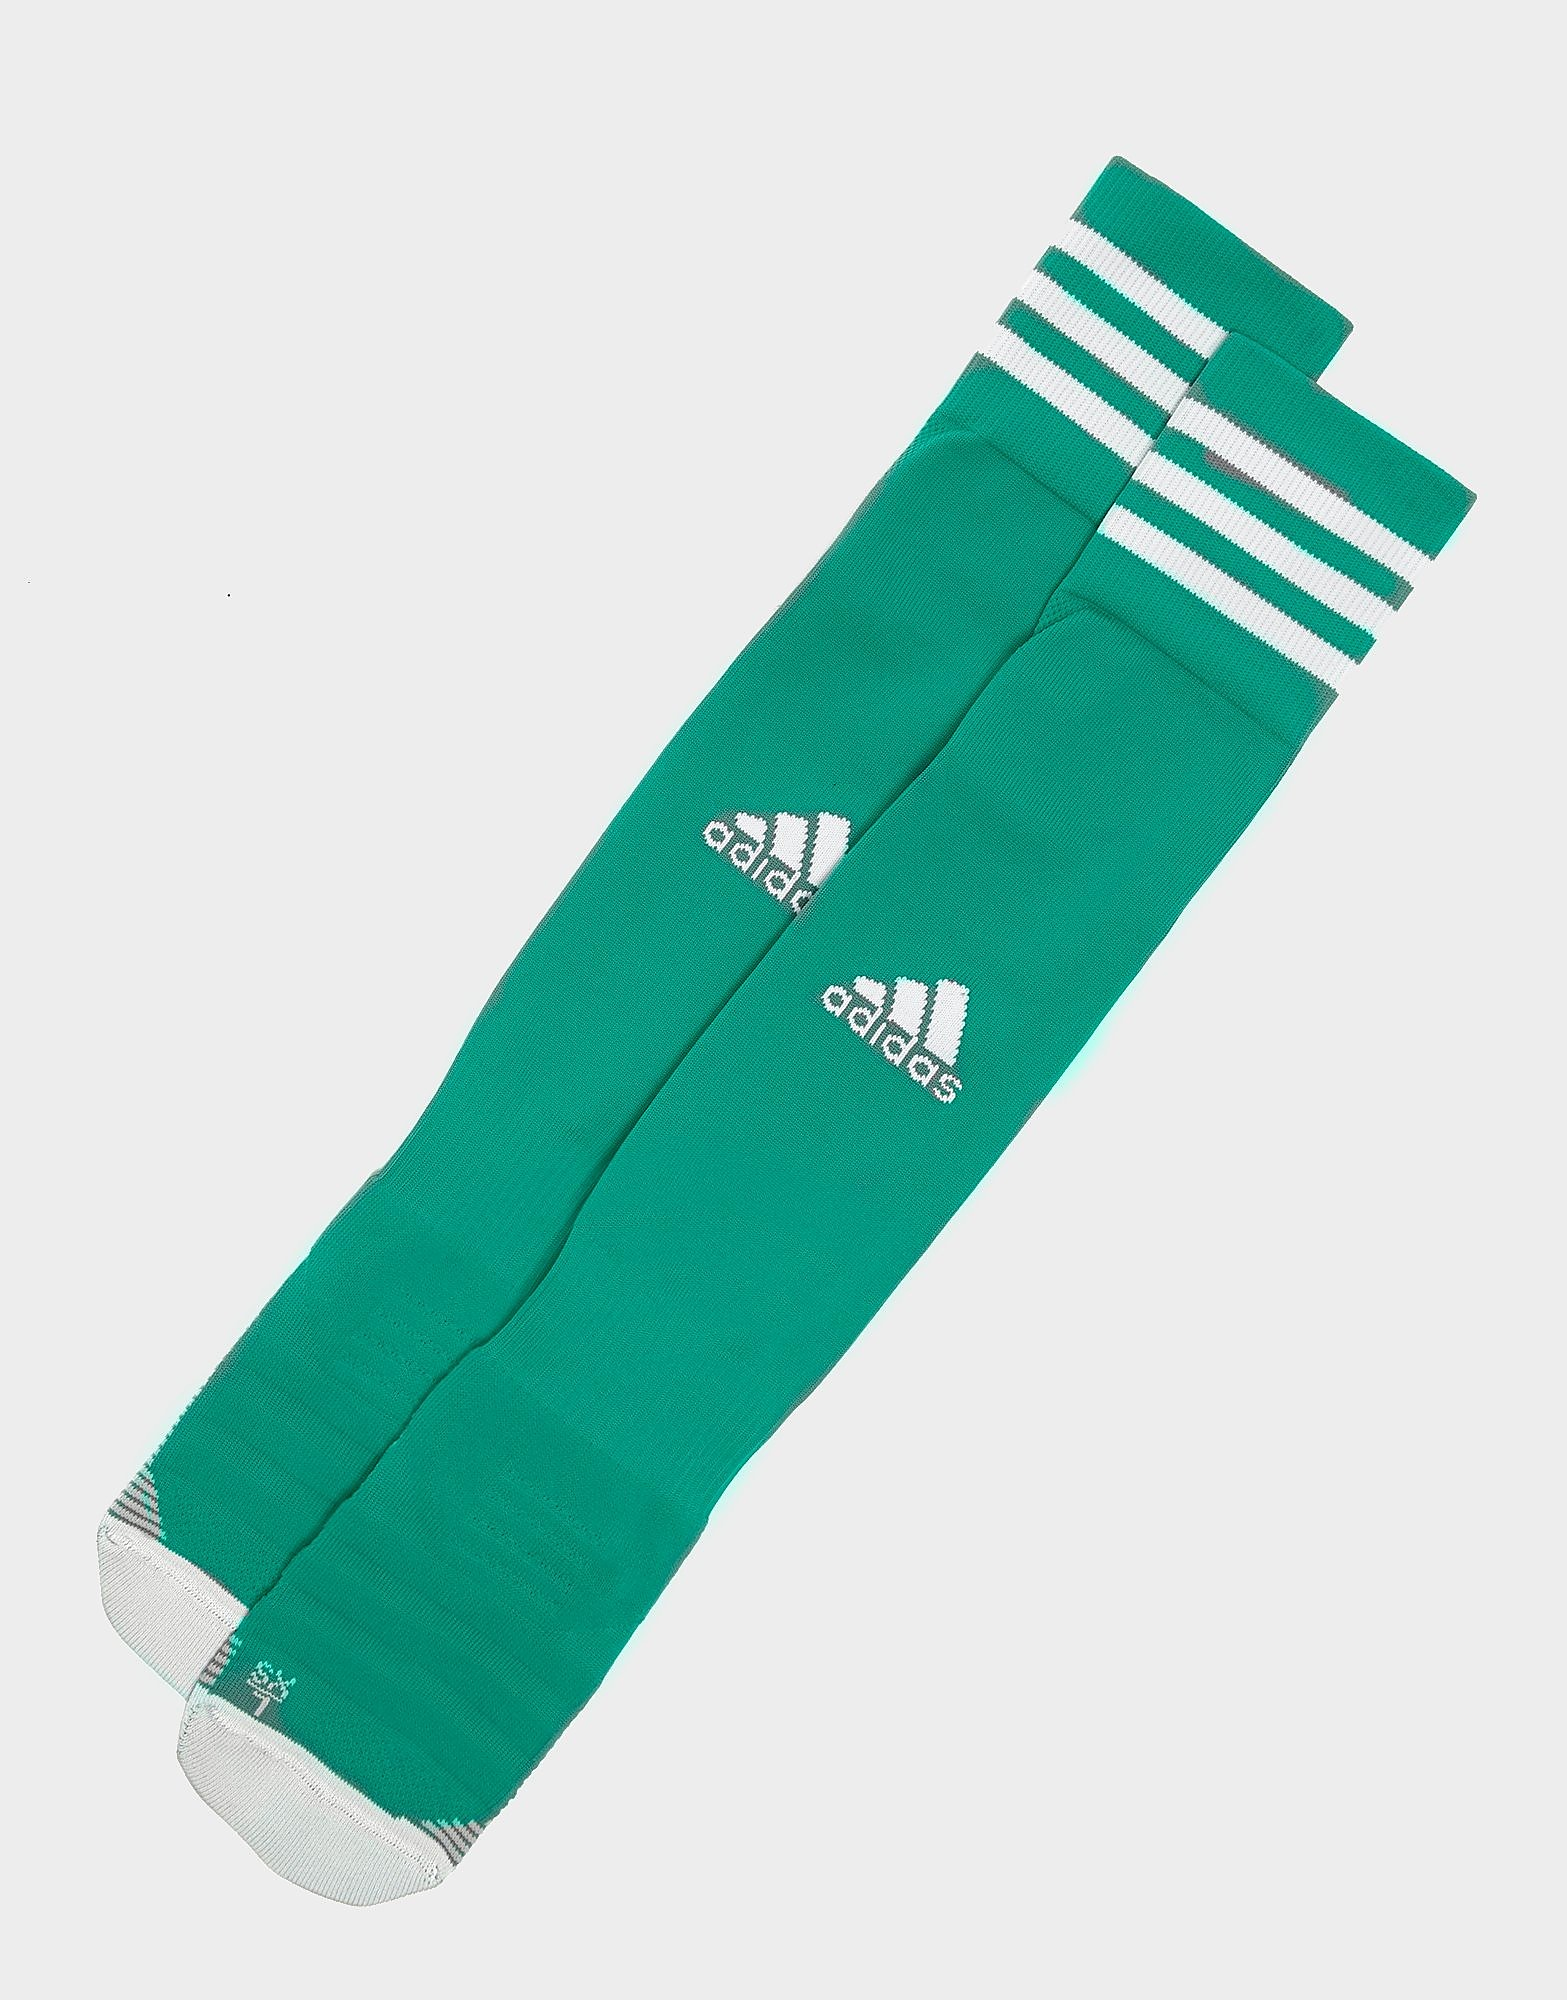 adidas Wales 2018/19 Away Socks Junior - Groen - Kind